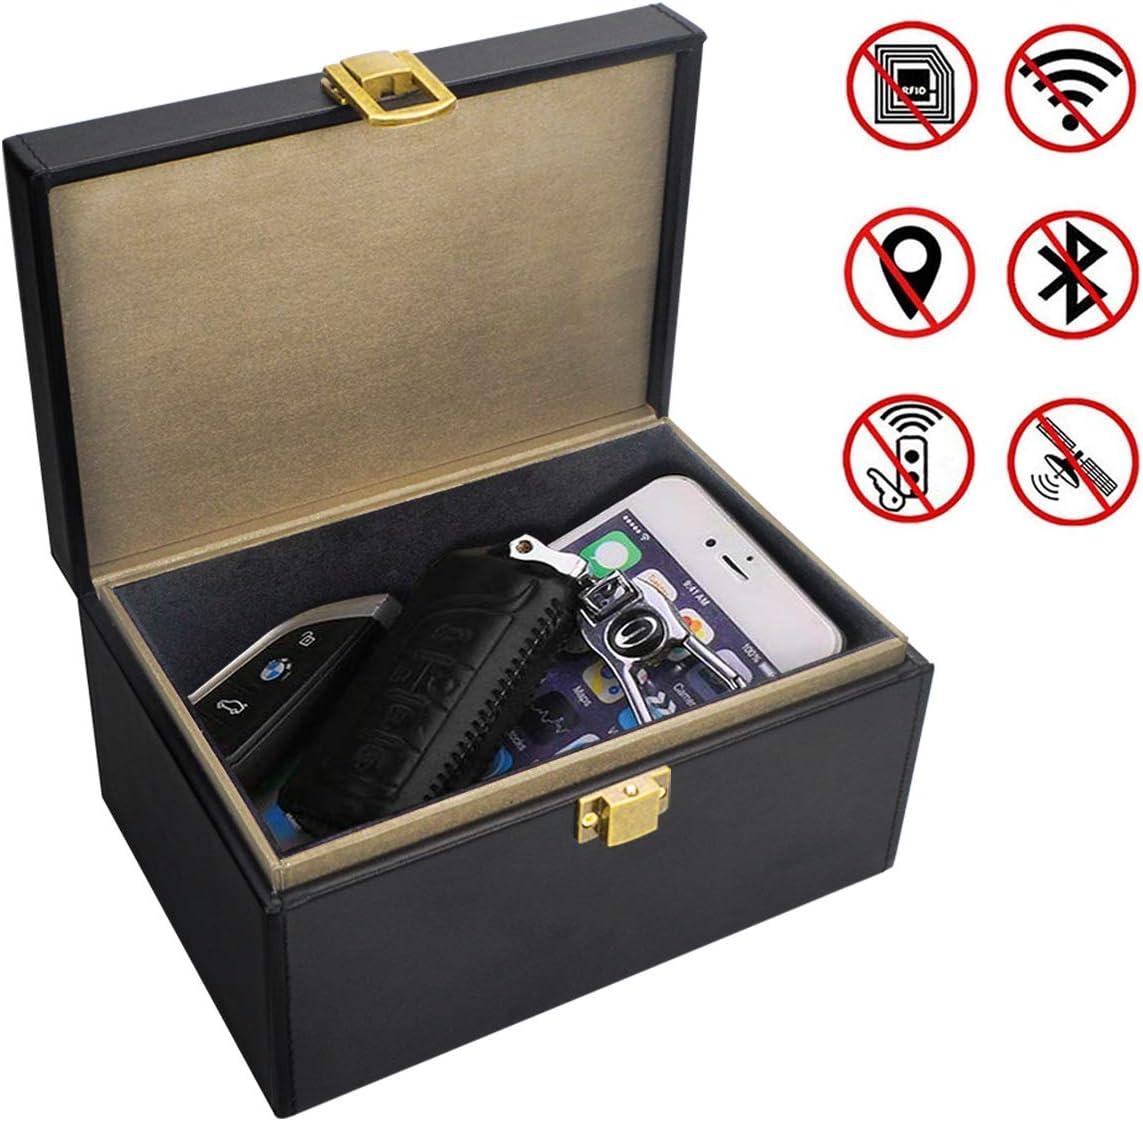 Qcore Faraday Caja para llaves de coche, caja de bloqueo de señal de llave de coche grande, jaula de piel antirrobo para Faraday, bolsa sin llave RFID para llaves de coche, caja